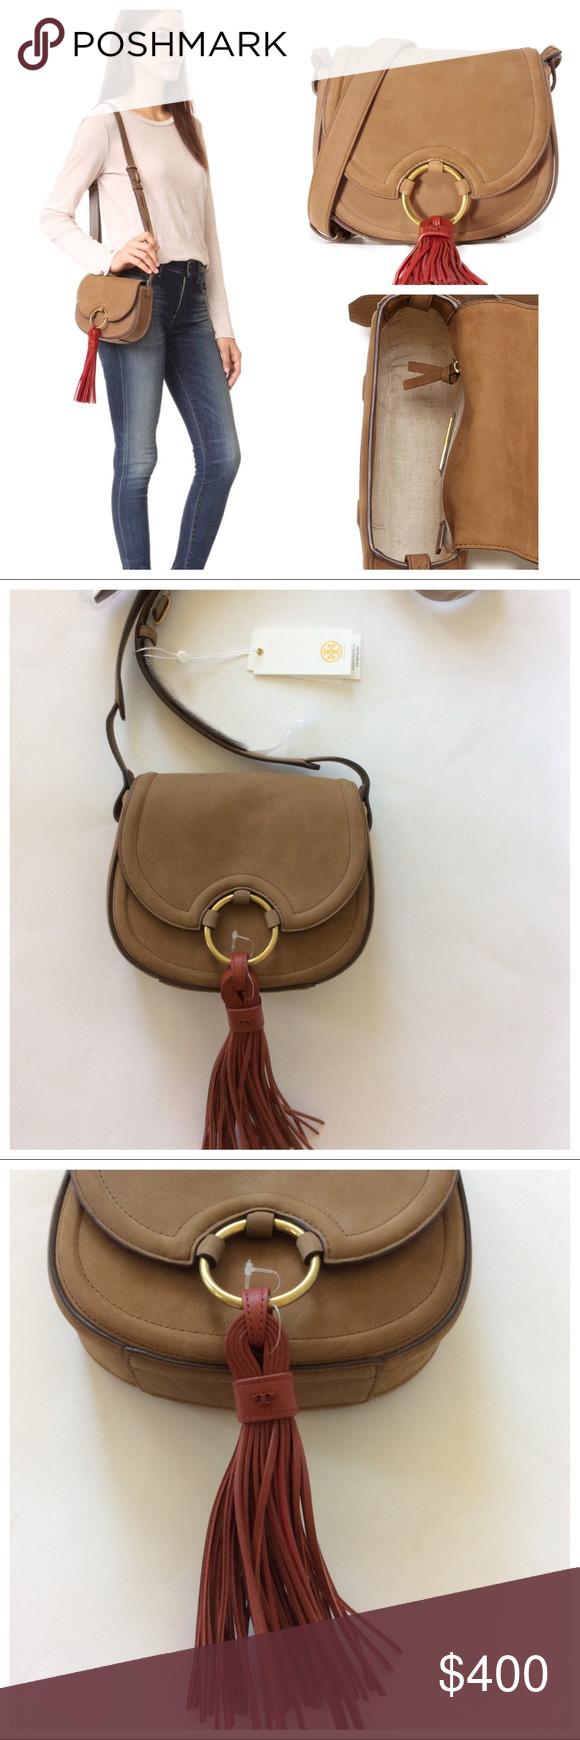 Tory Burch Tassel Mini Leather Saddle Bag Tory Burch Tassel Mini Leather  Saddle Bag in River Rock. Gorgeous nubuck leather bag Gold toned hardware. 2de7d41e87